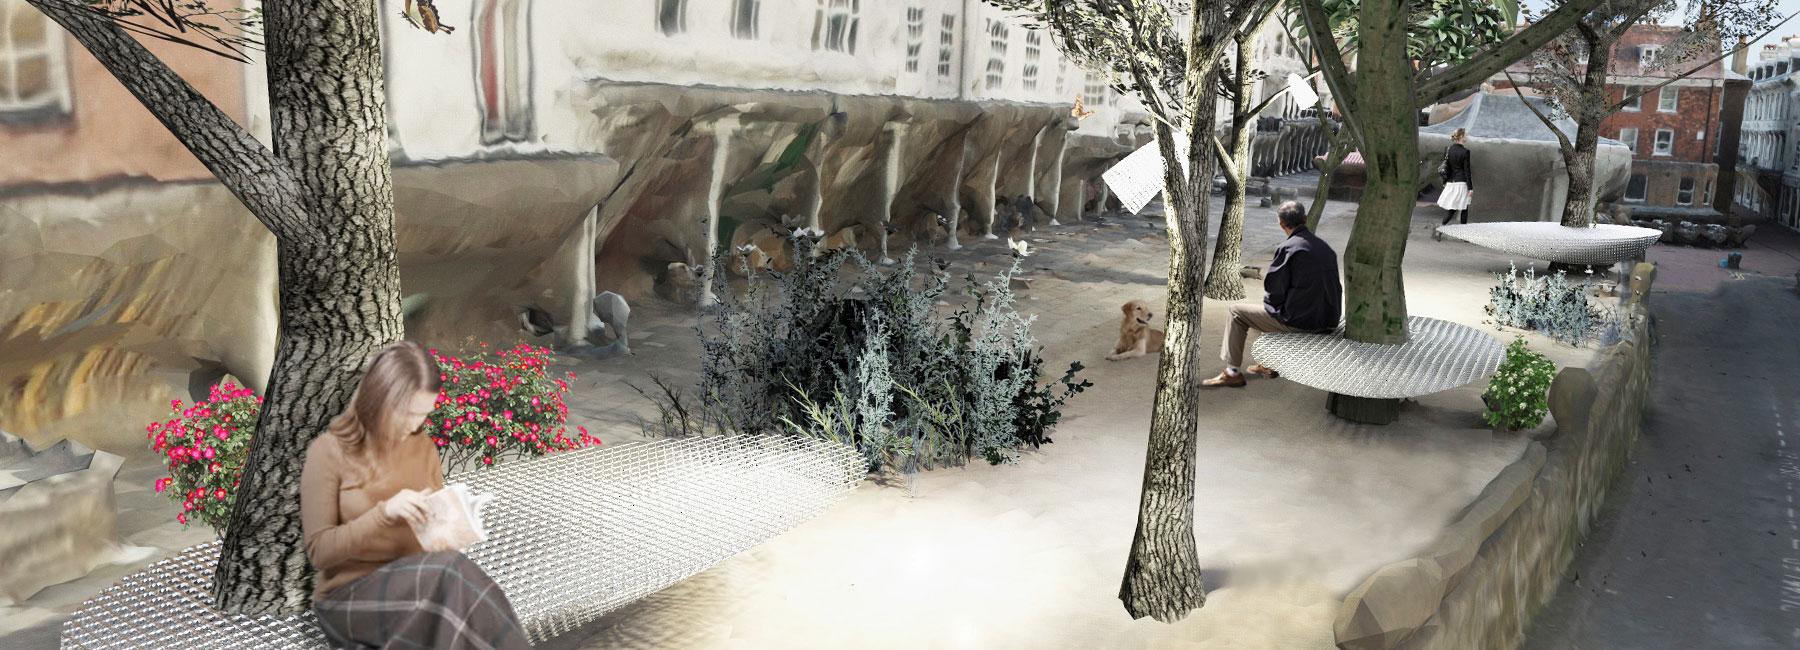 symbio-yarden-mor-technology-nature-designboom-1800.jpg